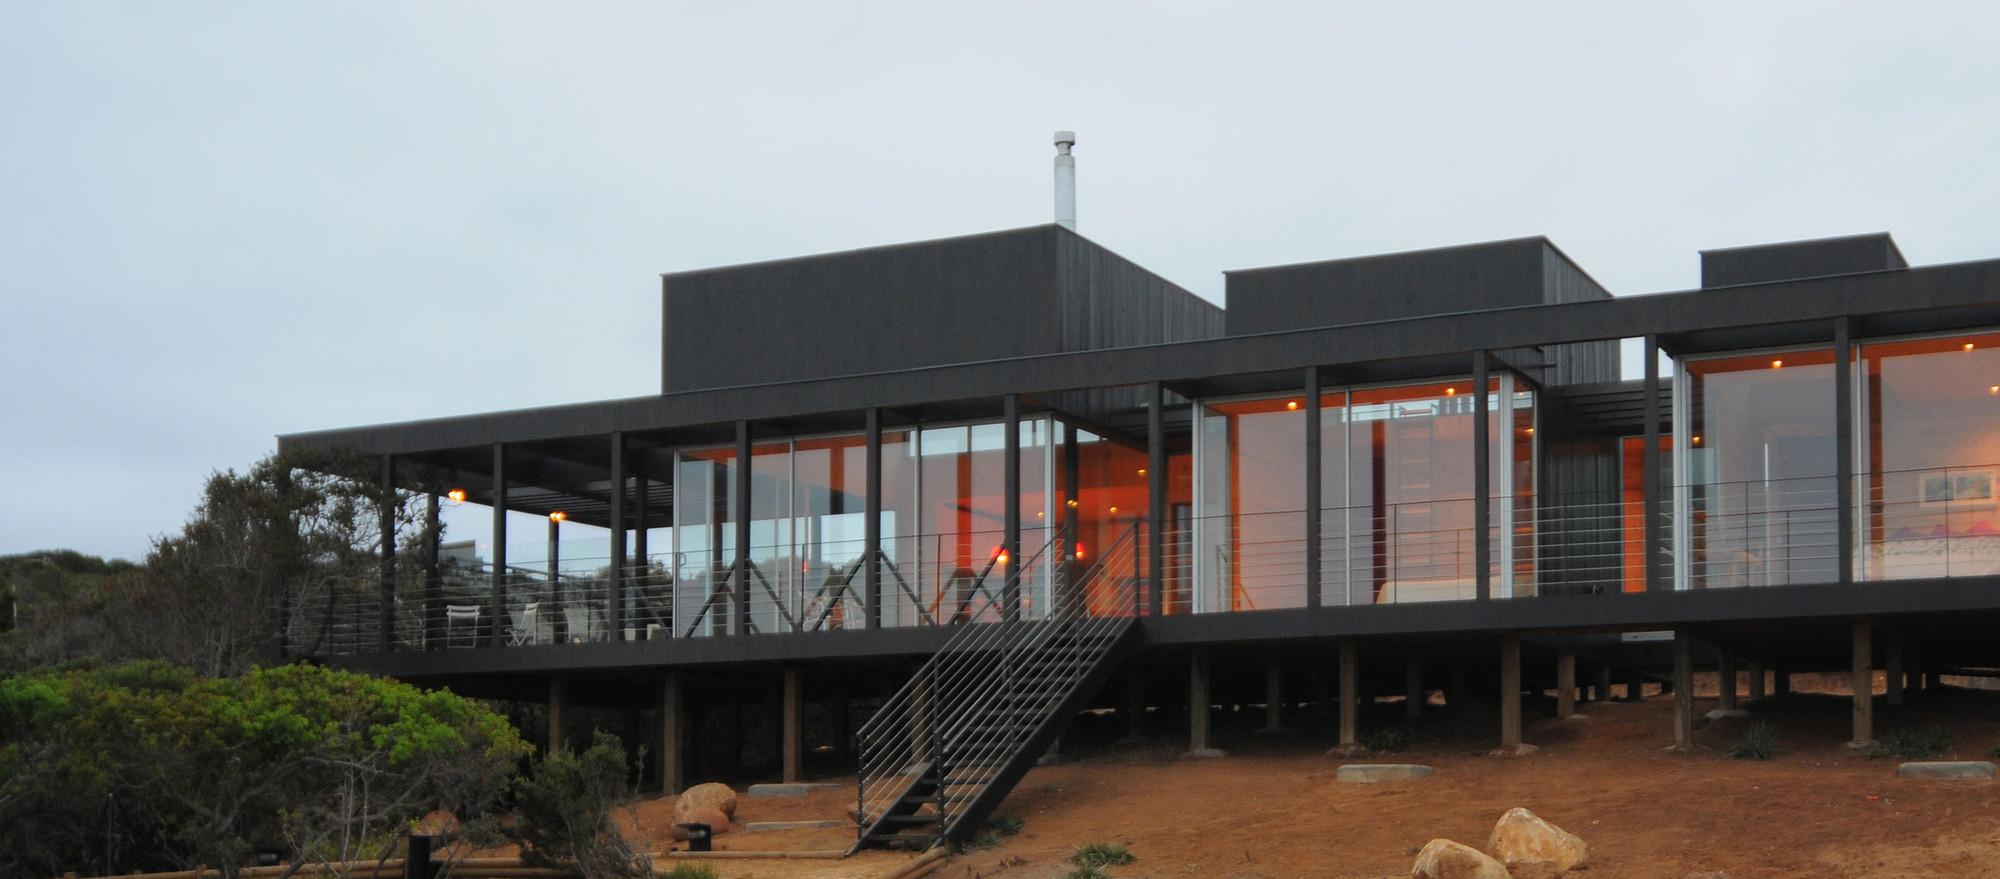 Casa Rodríguez Harvey / Loi Arquitectos, © Marcos Mendizabal